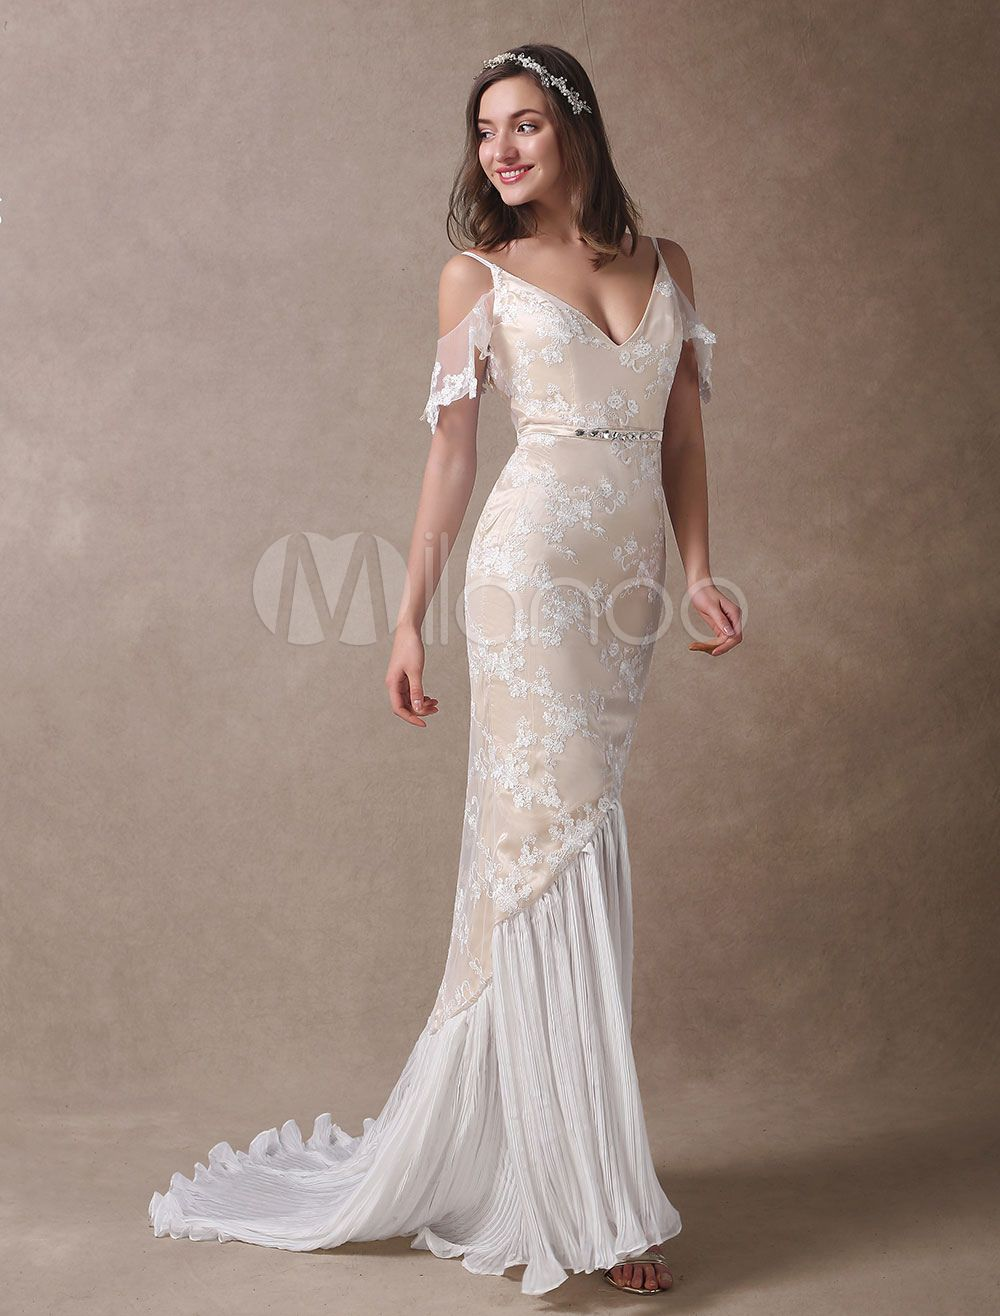 Boho wedding dresses champagne lace beach bridal dress mermaid v